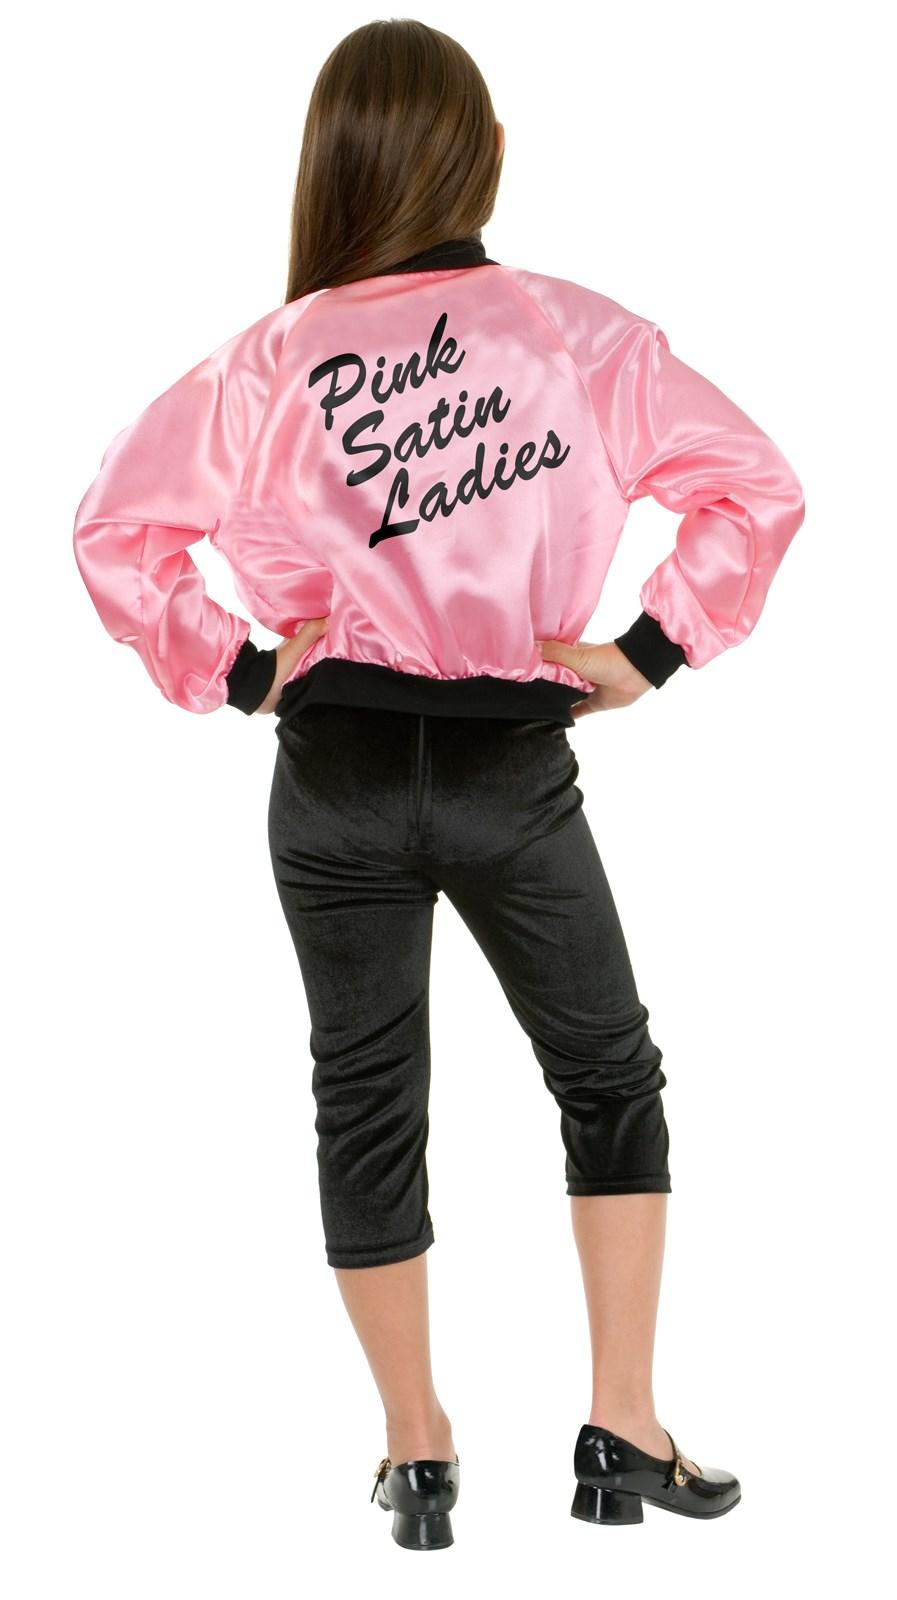 Pink Satin Ladies Kids Jacket | BuyCostumes.com